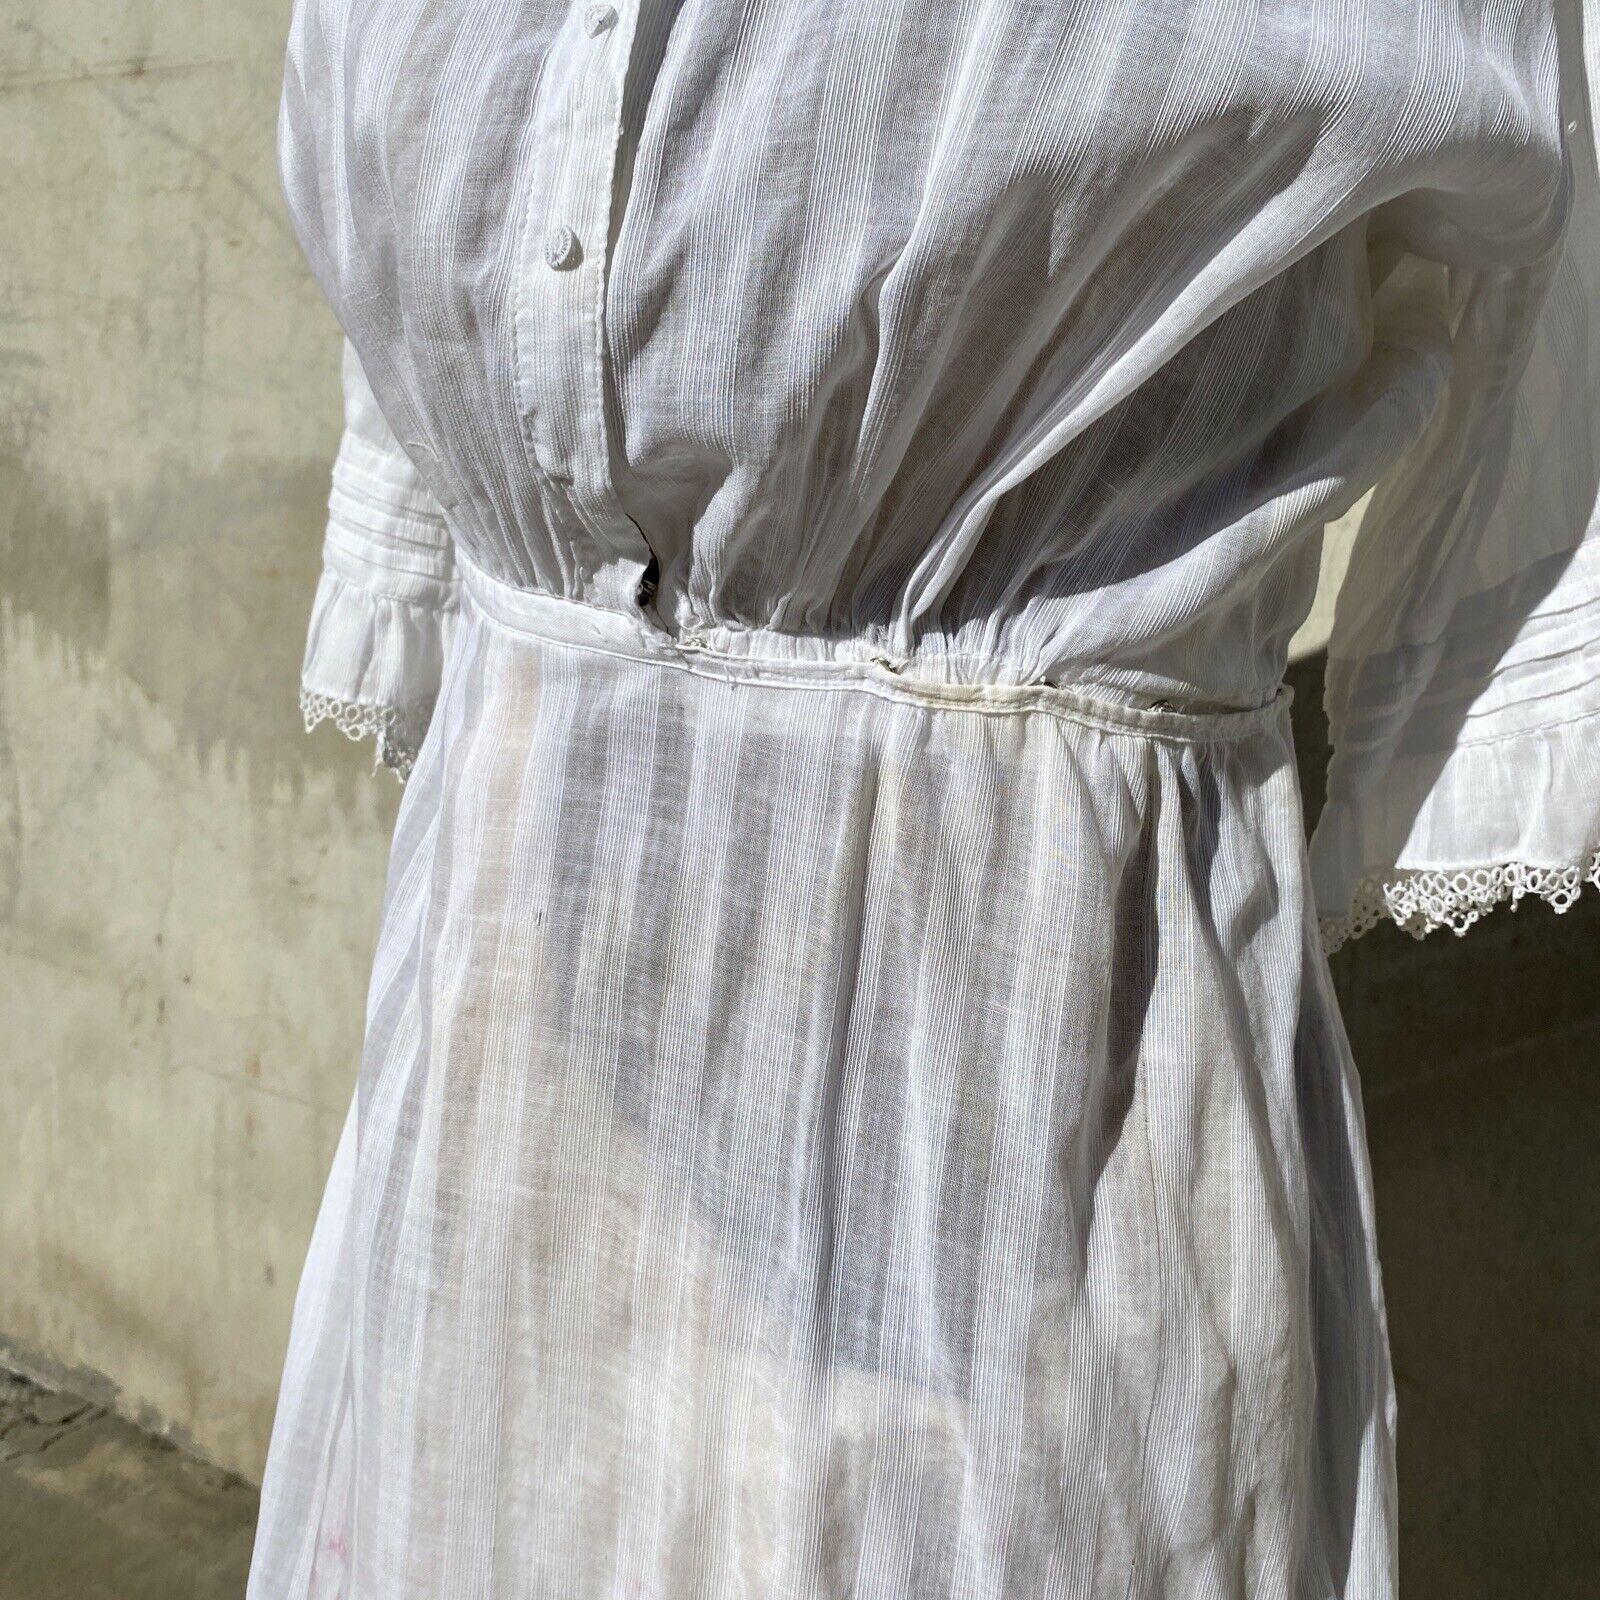 Antique Edwardian White Cotton Tea Dress Maxi Lac… - image 4